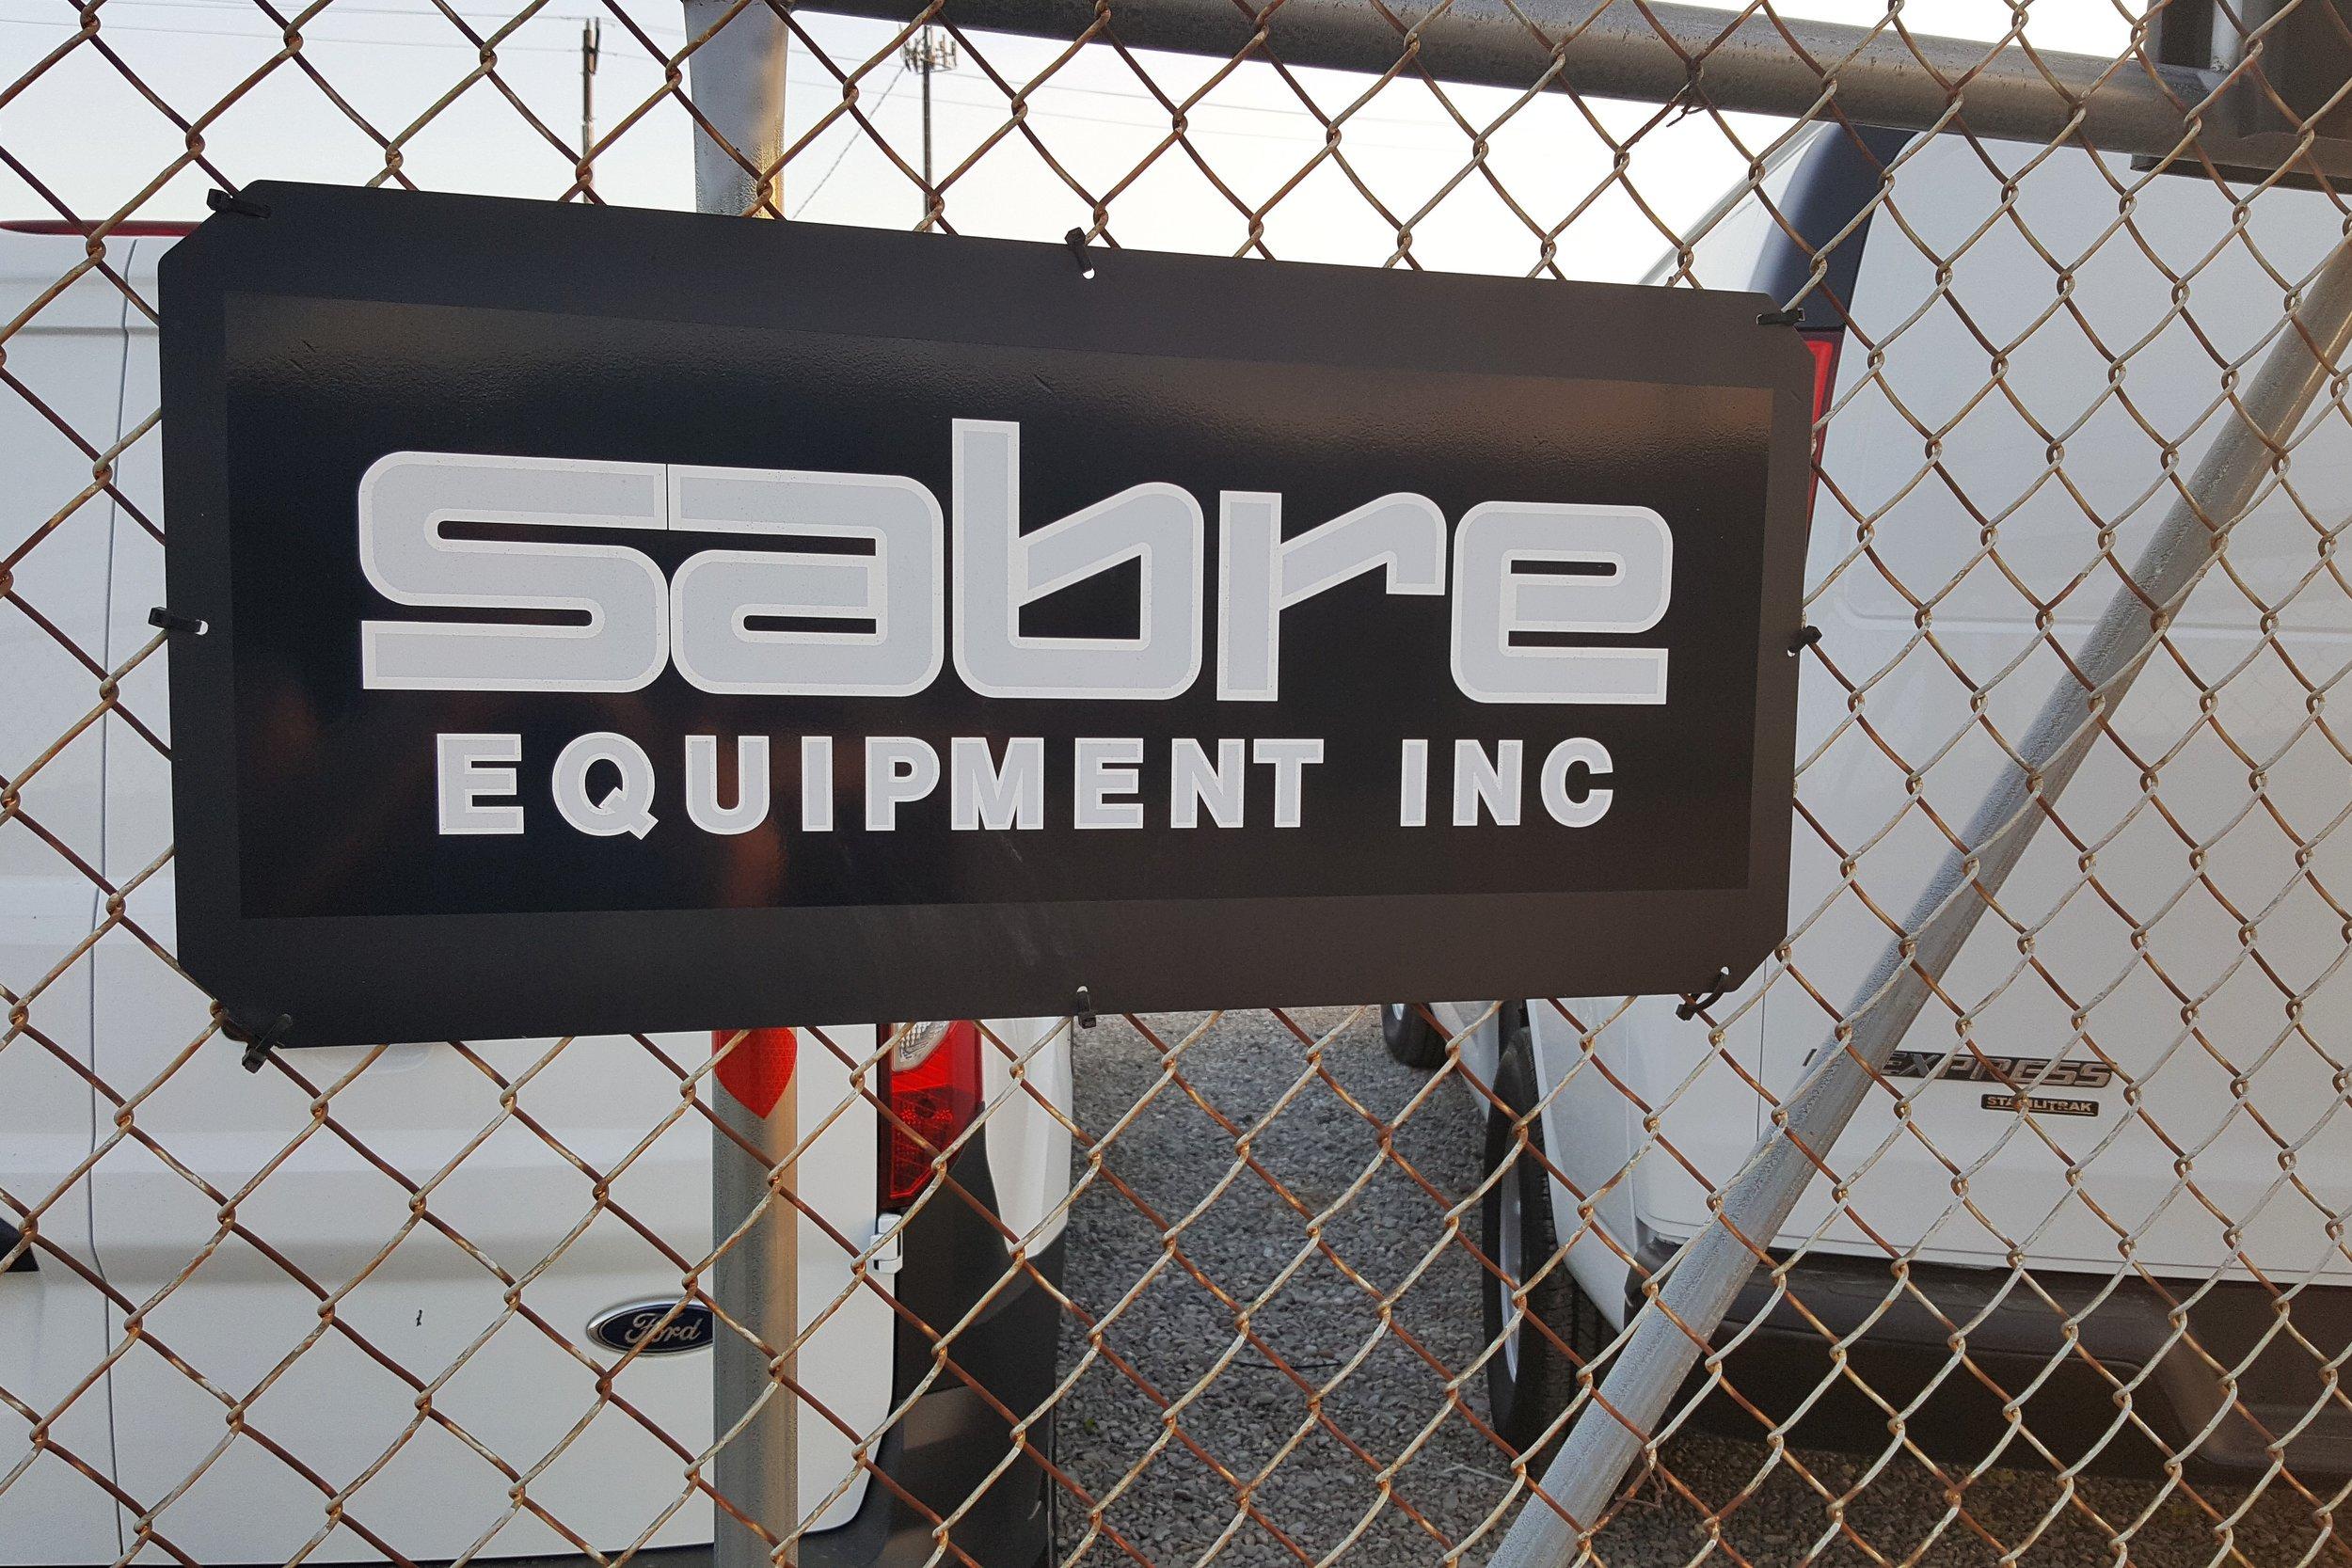 Sabre Equipment - 802 Pennsylvania Ave, (412) 262-3080